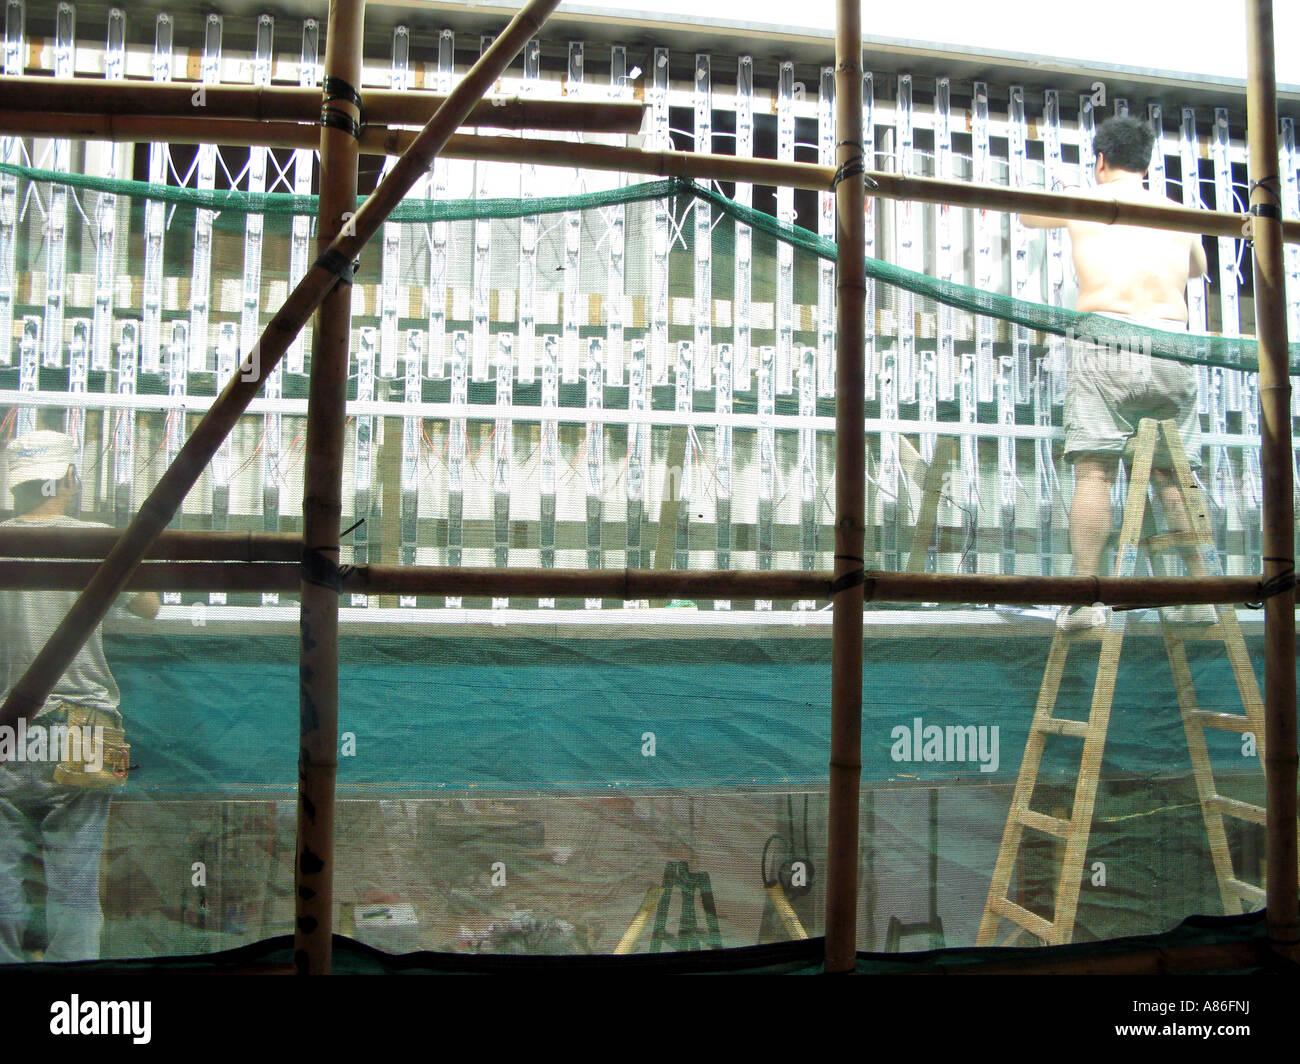 Hong Kong construction site - Stock Image